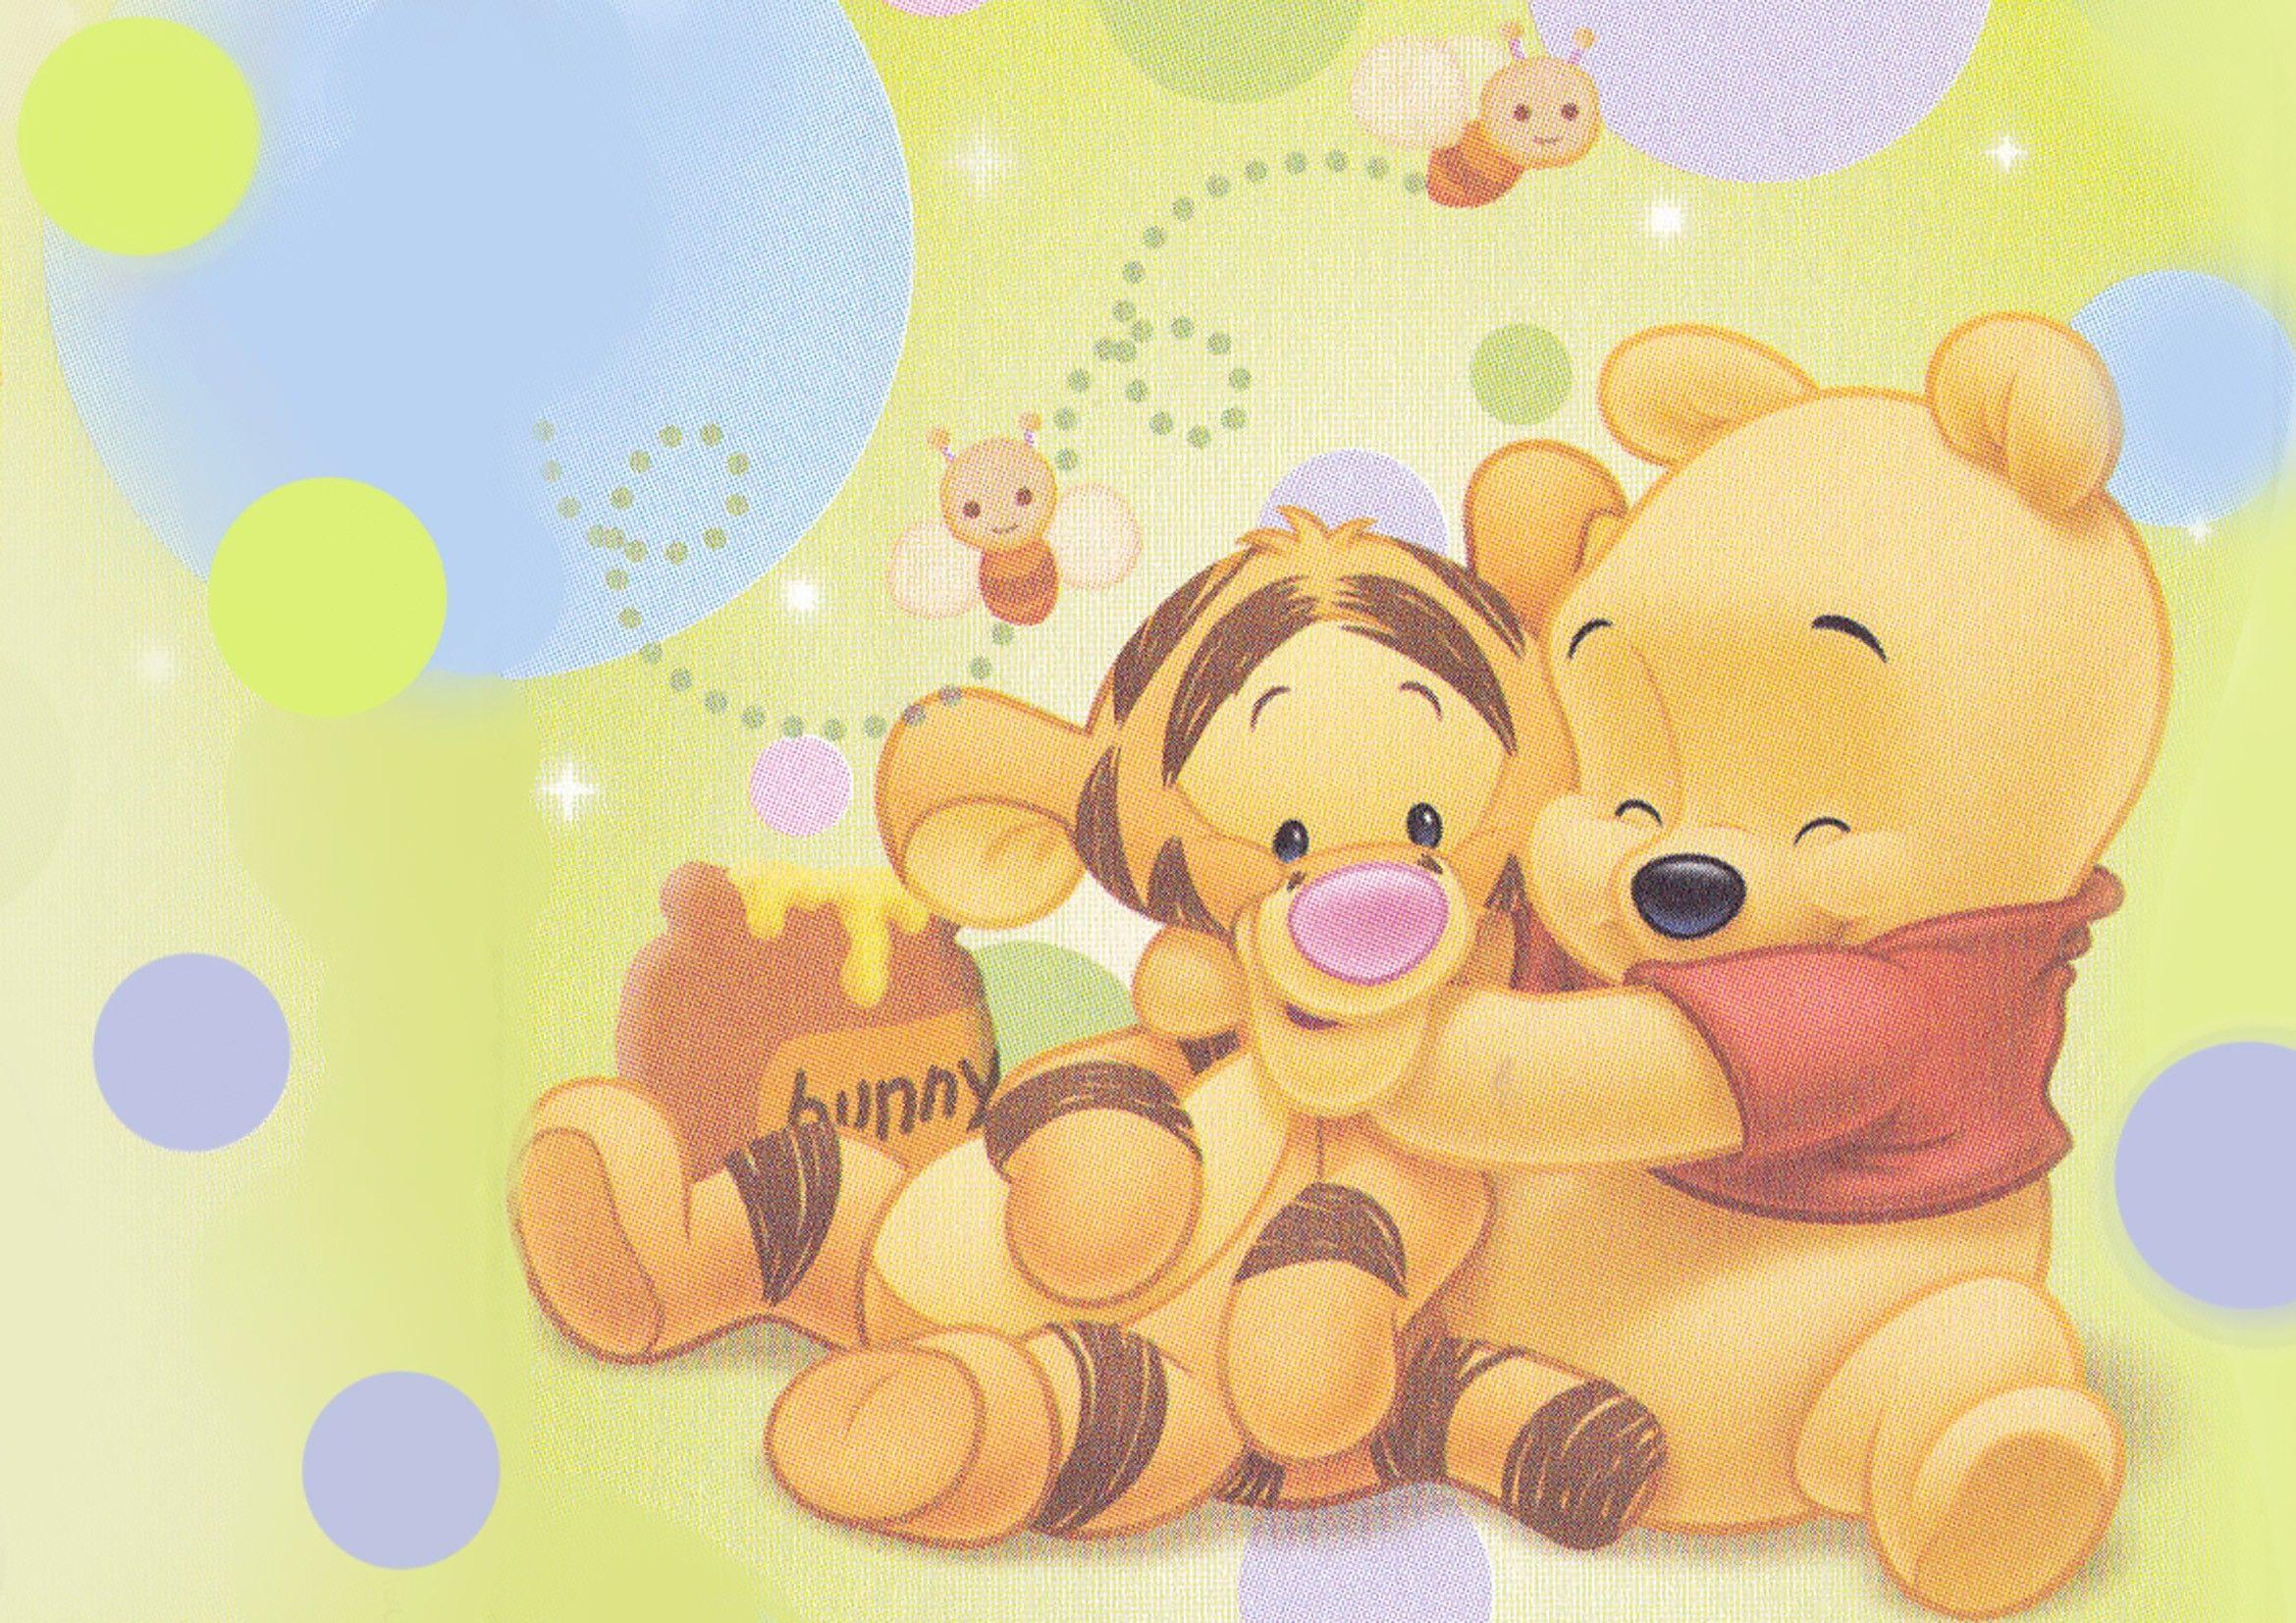 Winnie The Pooh Screensavers